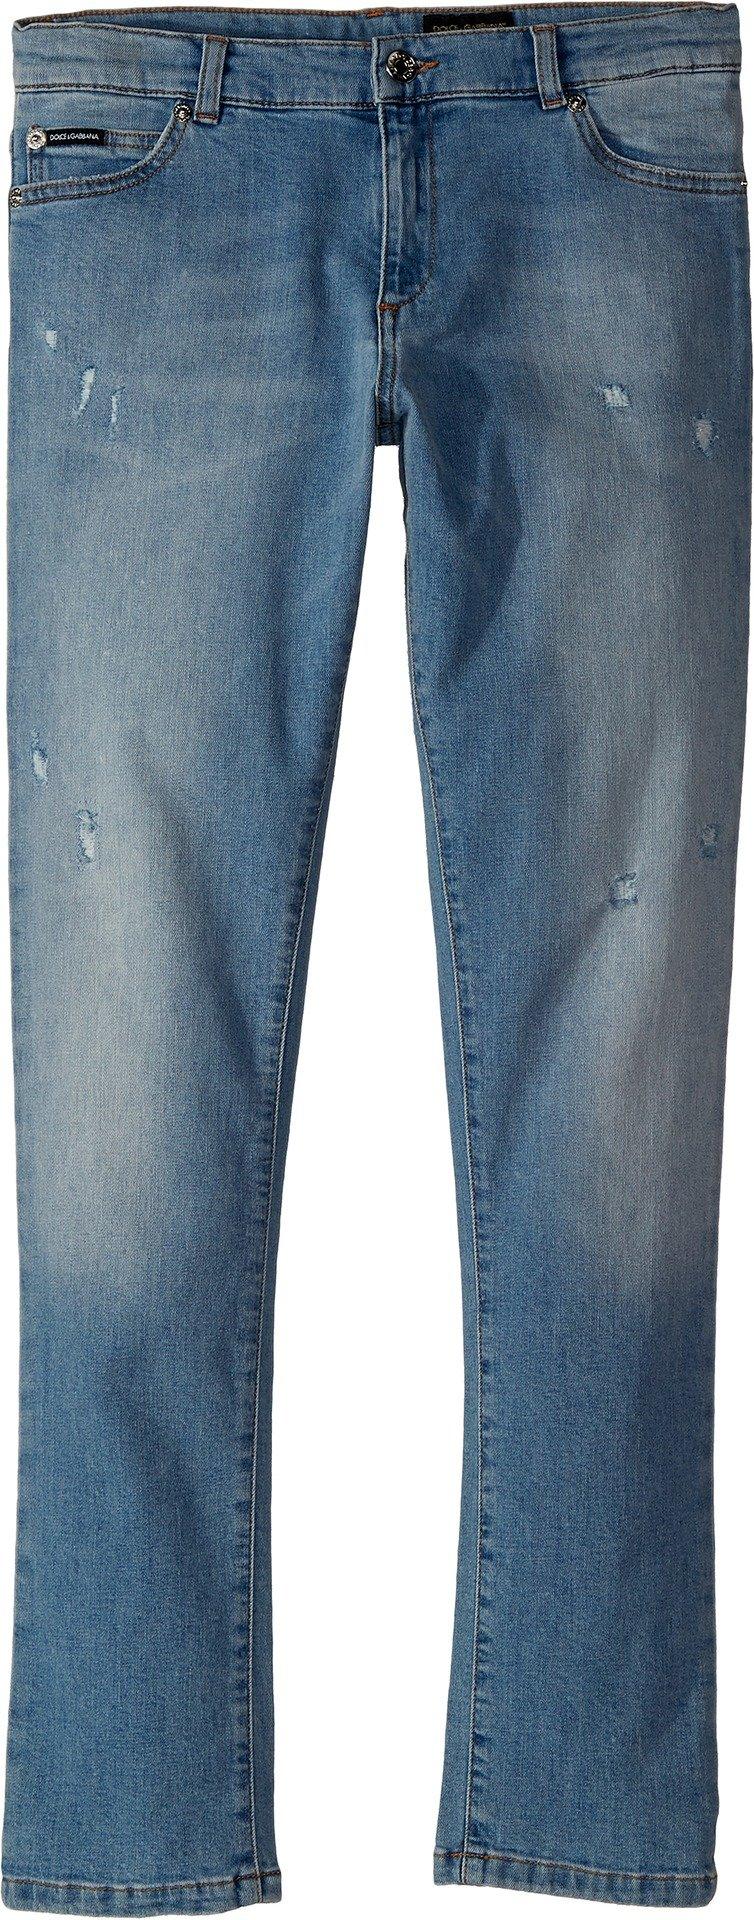 Dolce & Gabbana Kids Boy's Five-Pocket Trousers (Big Kids) Dark Blue 12